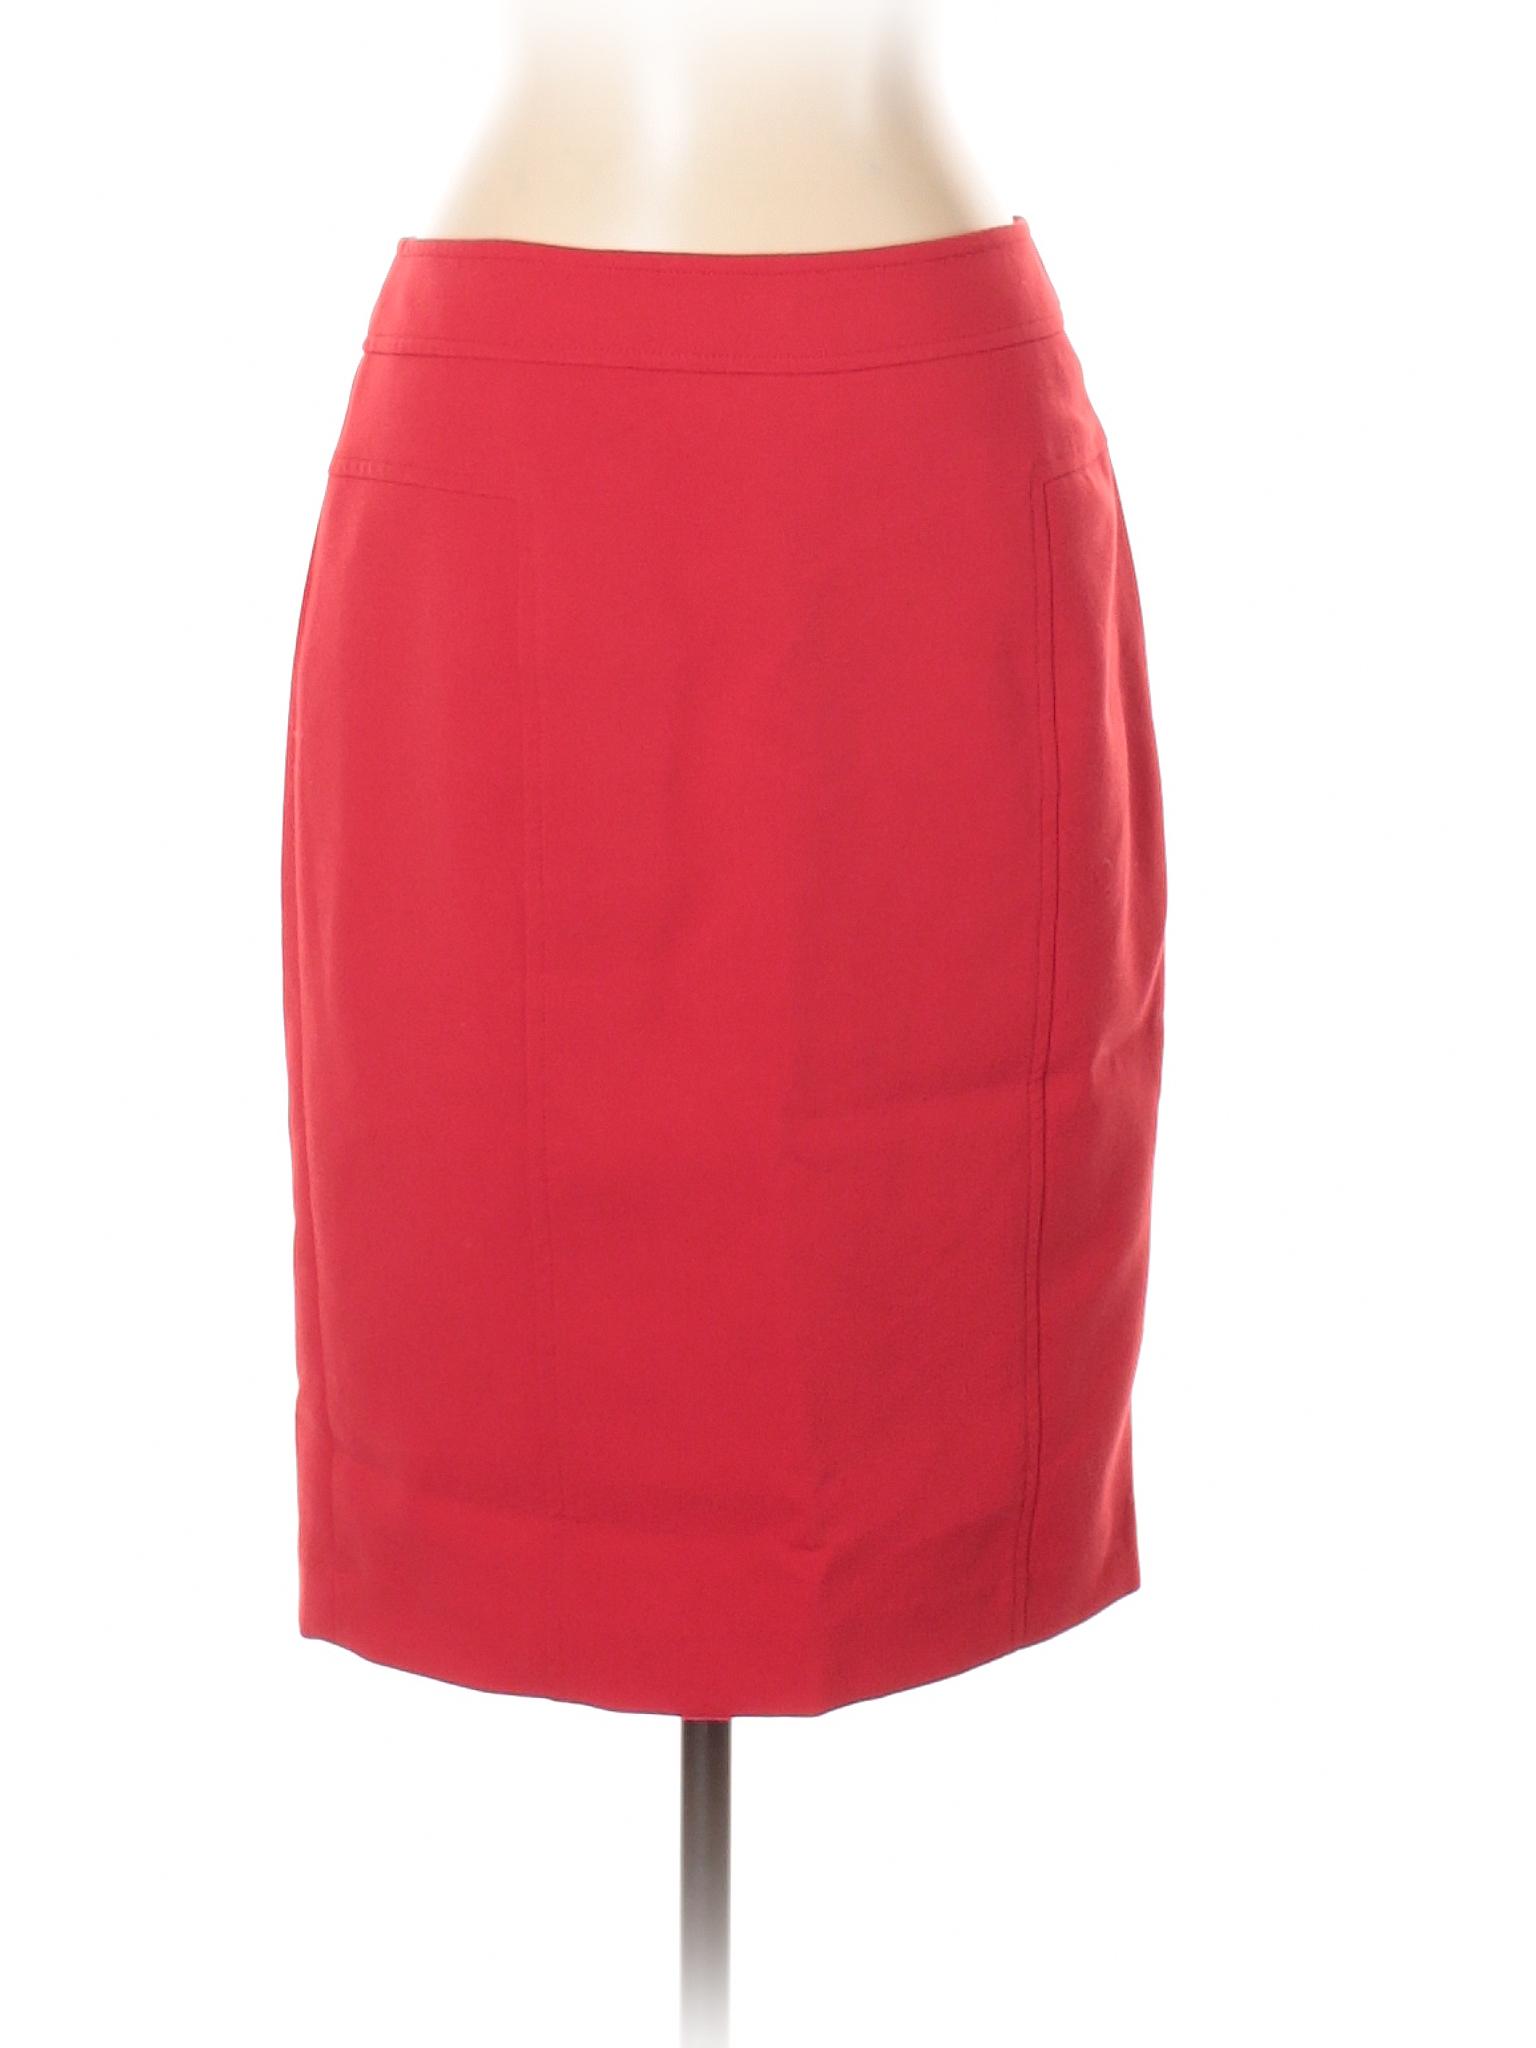 Boutique Casual Boutique Skirt Anne Anne Klein qwvdqF